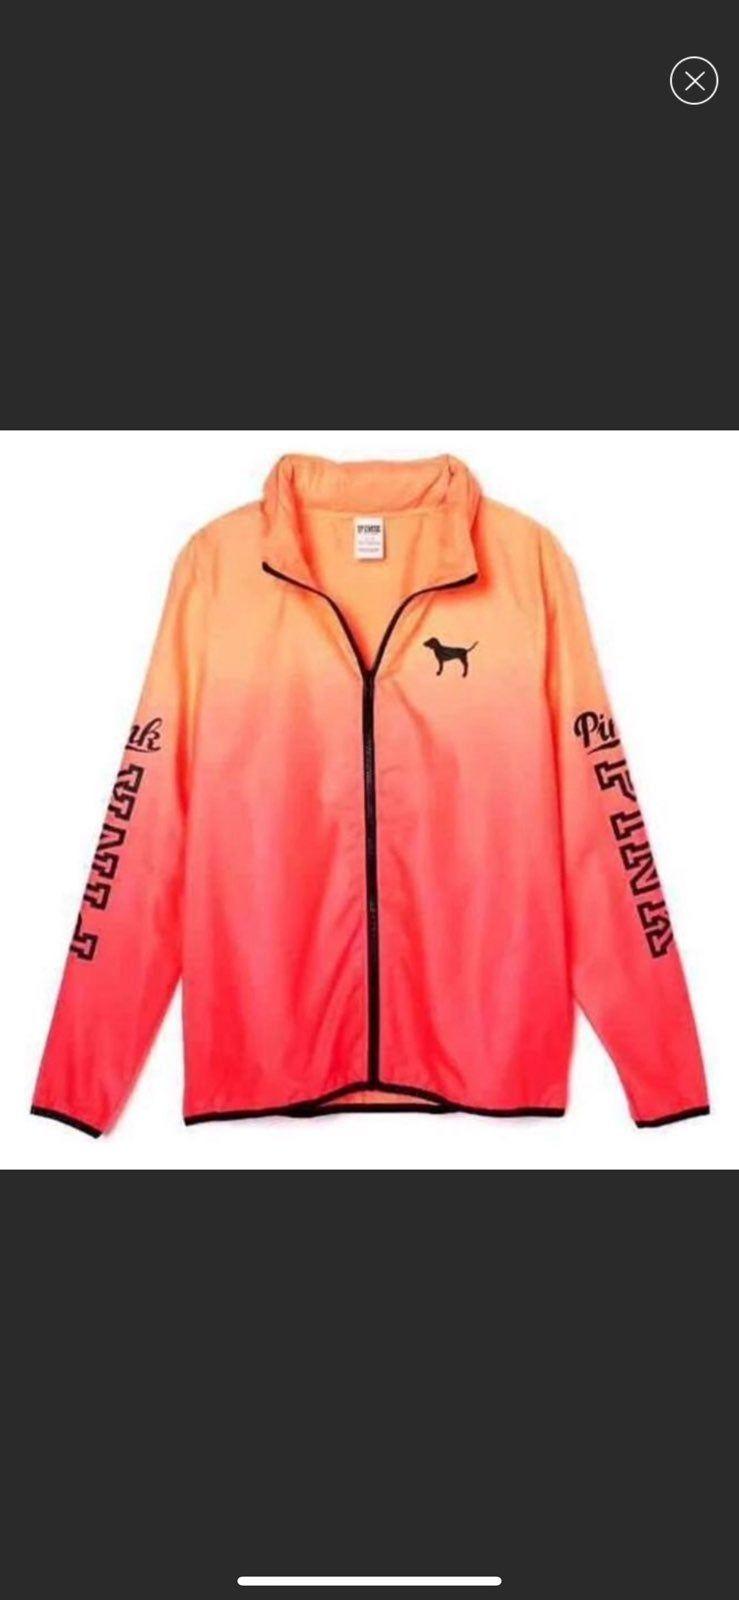 Victoria S Secret Vs Pink Ombre Ombre Long Sleeve Anorak Windbreaker Jacket Size Xs S Xs S Small Pink Orange An Anorak Windbreaker Jacket Cute Comfy Outfits [ 1600 x 739 Pixel ]